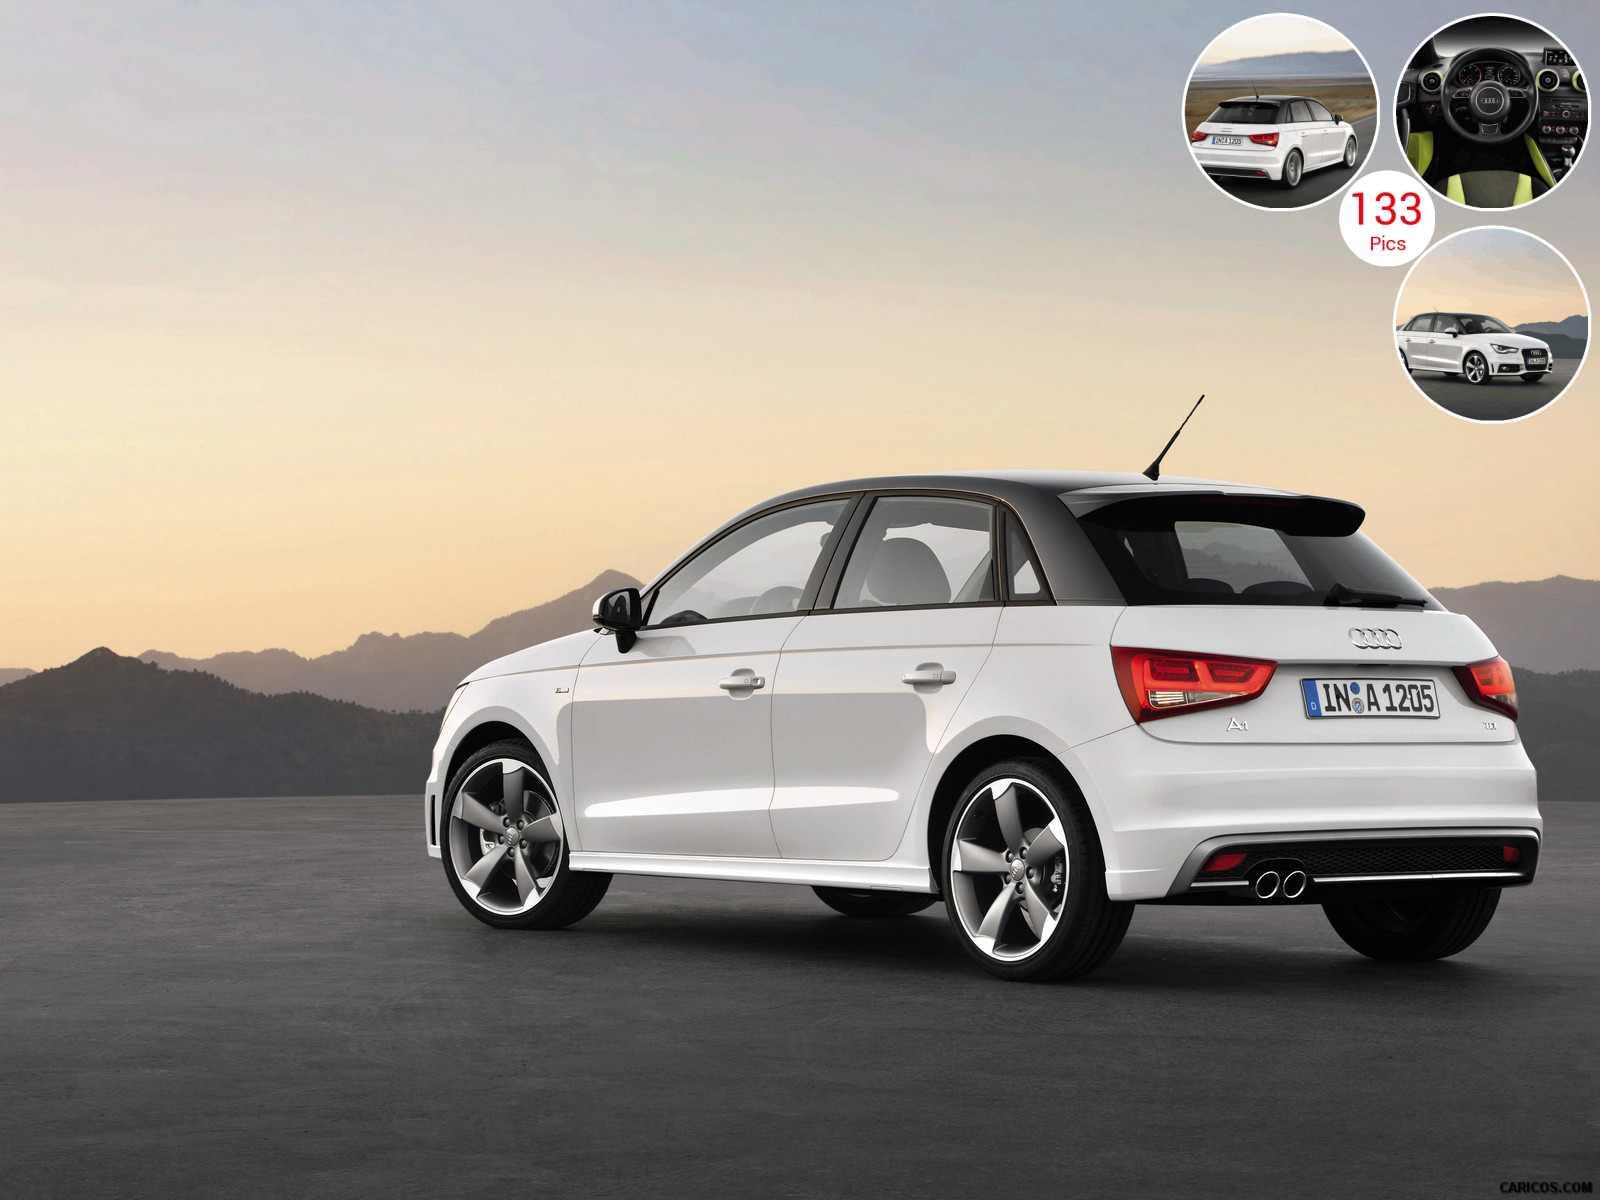 Audi A1 Sportback 40 Tfsi S Line 2018 4k Wallpaper 2016 Audi A1 Sportback 1600x1200 Wallpaper Teahub Io